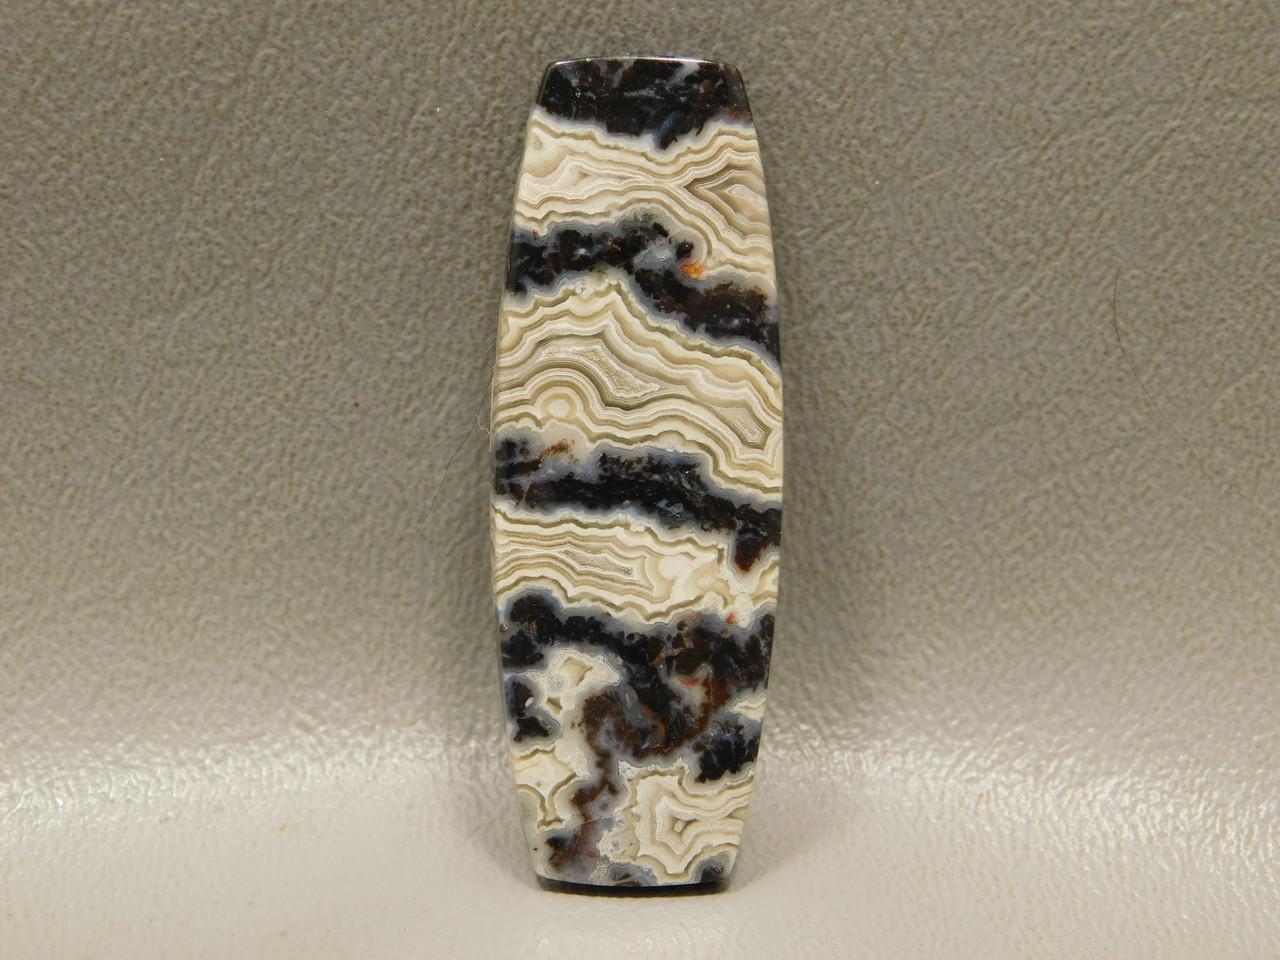 Black and White Crazy Lace Agate Designer Gemstone Cabochon #6